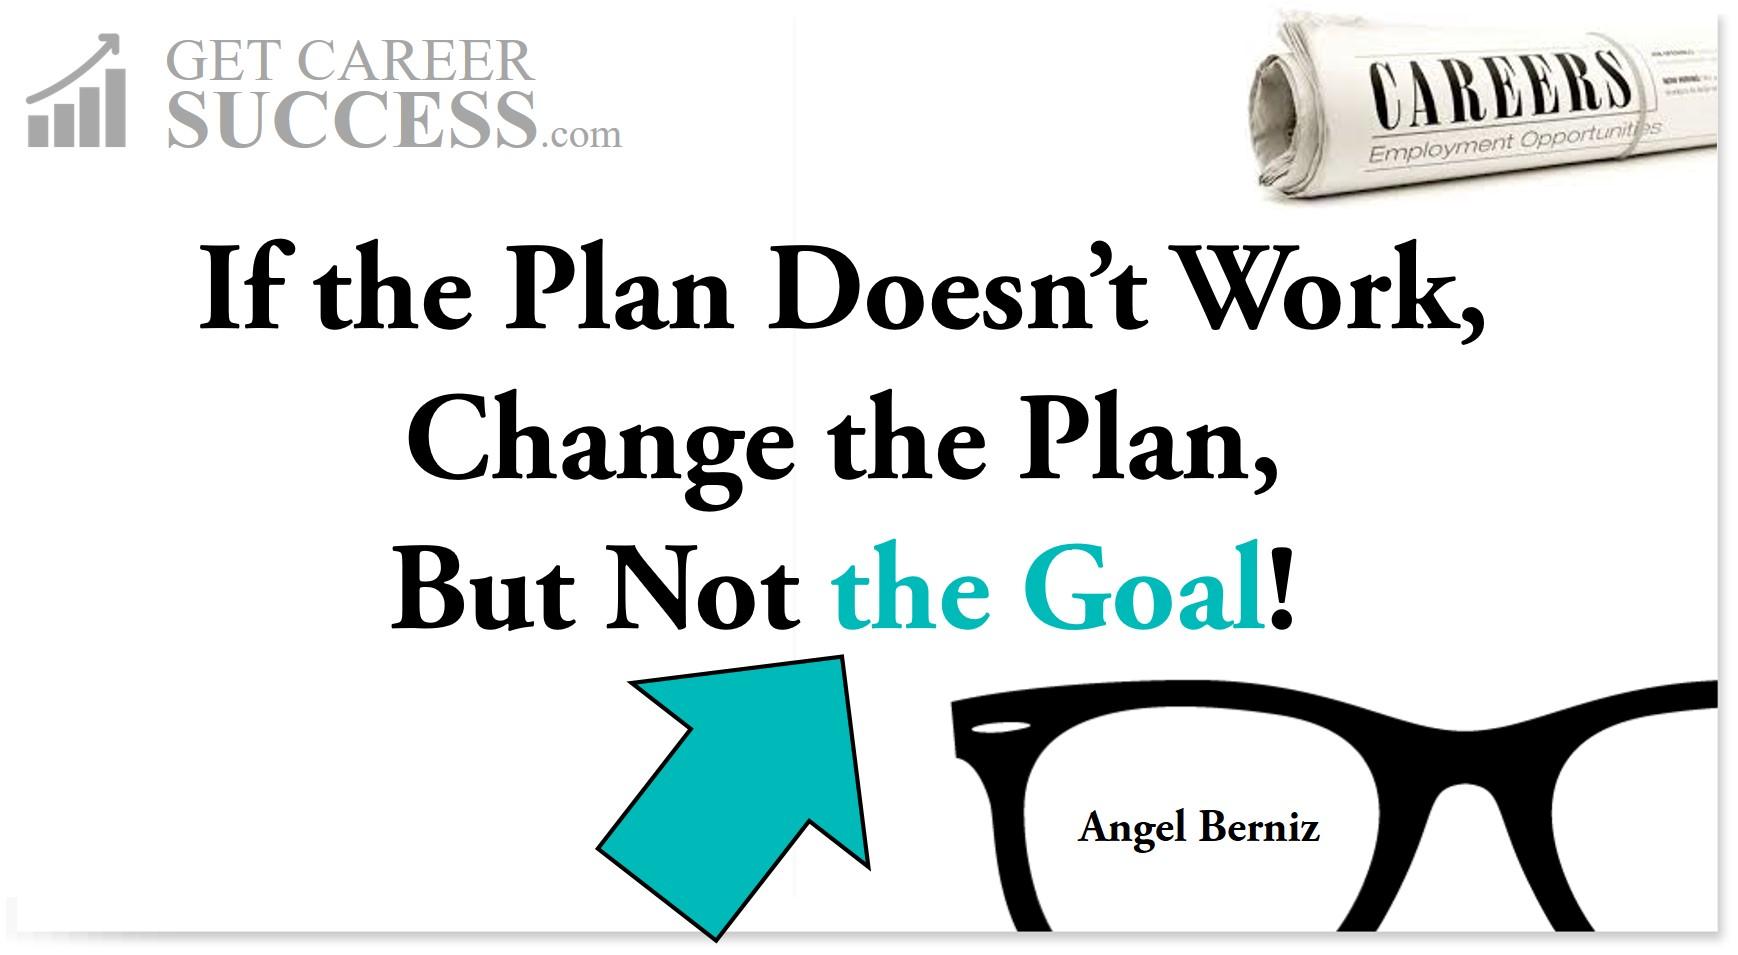 if-the-plan-doesnt-work-coach-angel-berniz